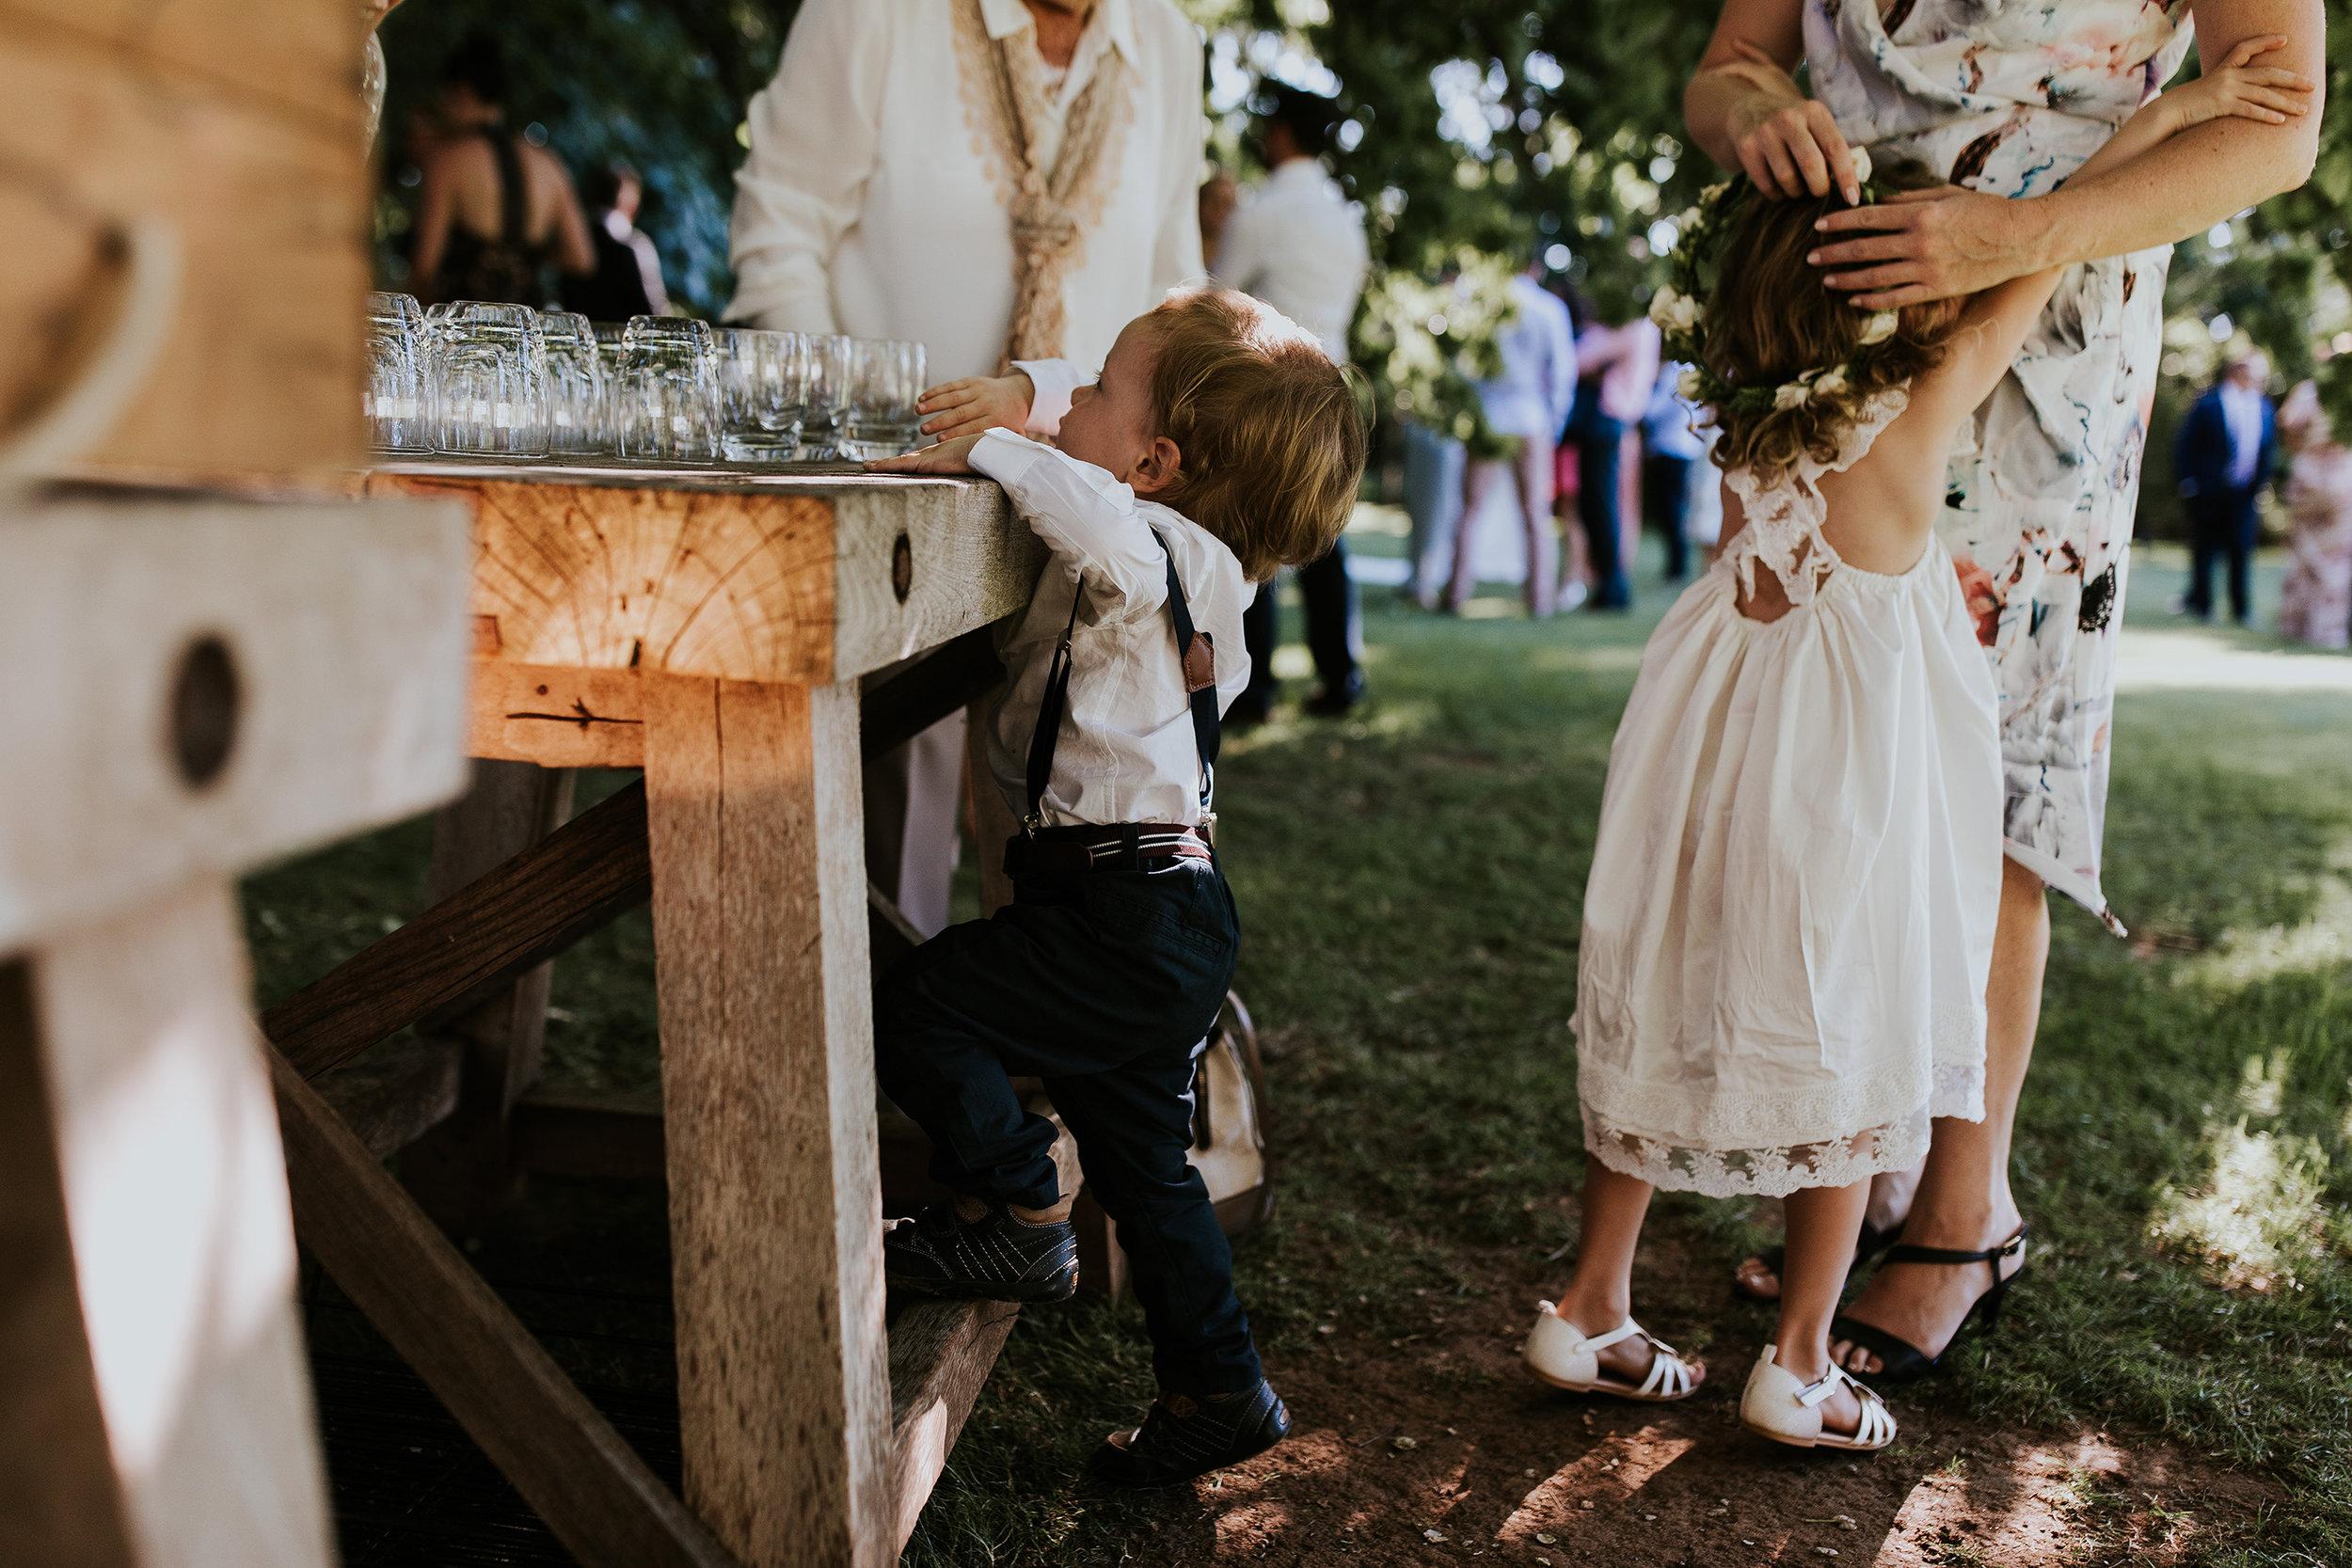 keli-luke-maybury-wedding-239_1.jpg